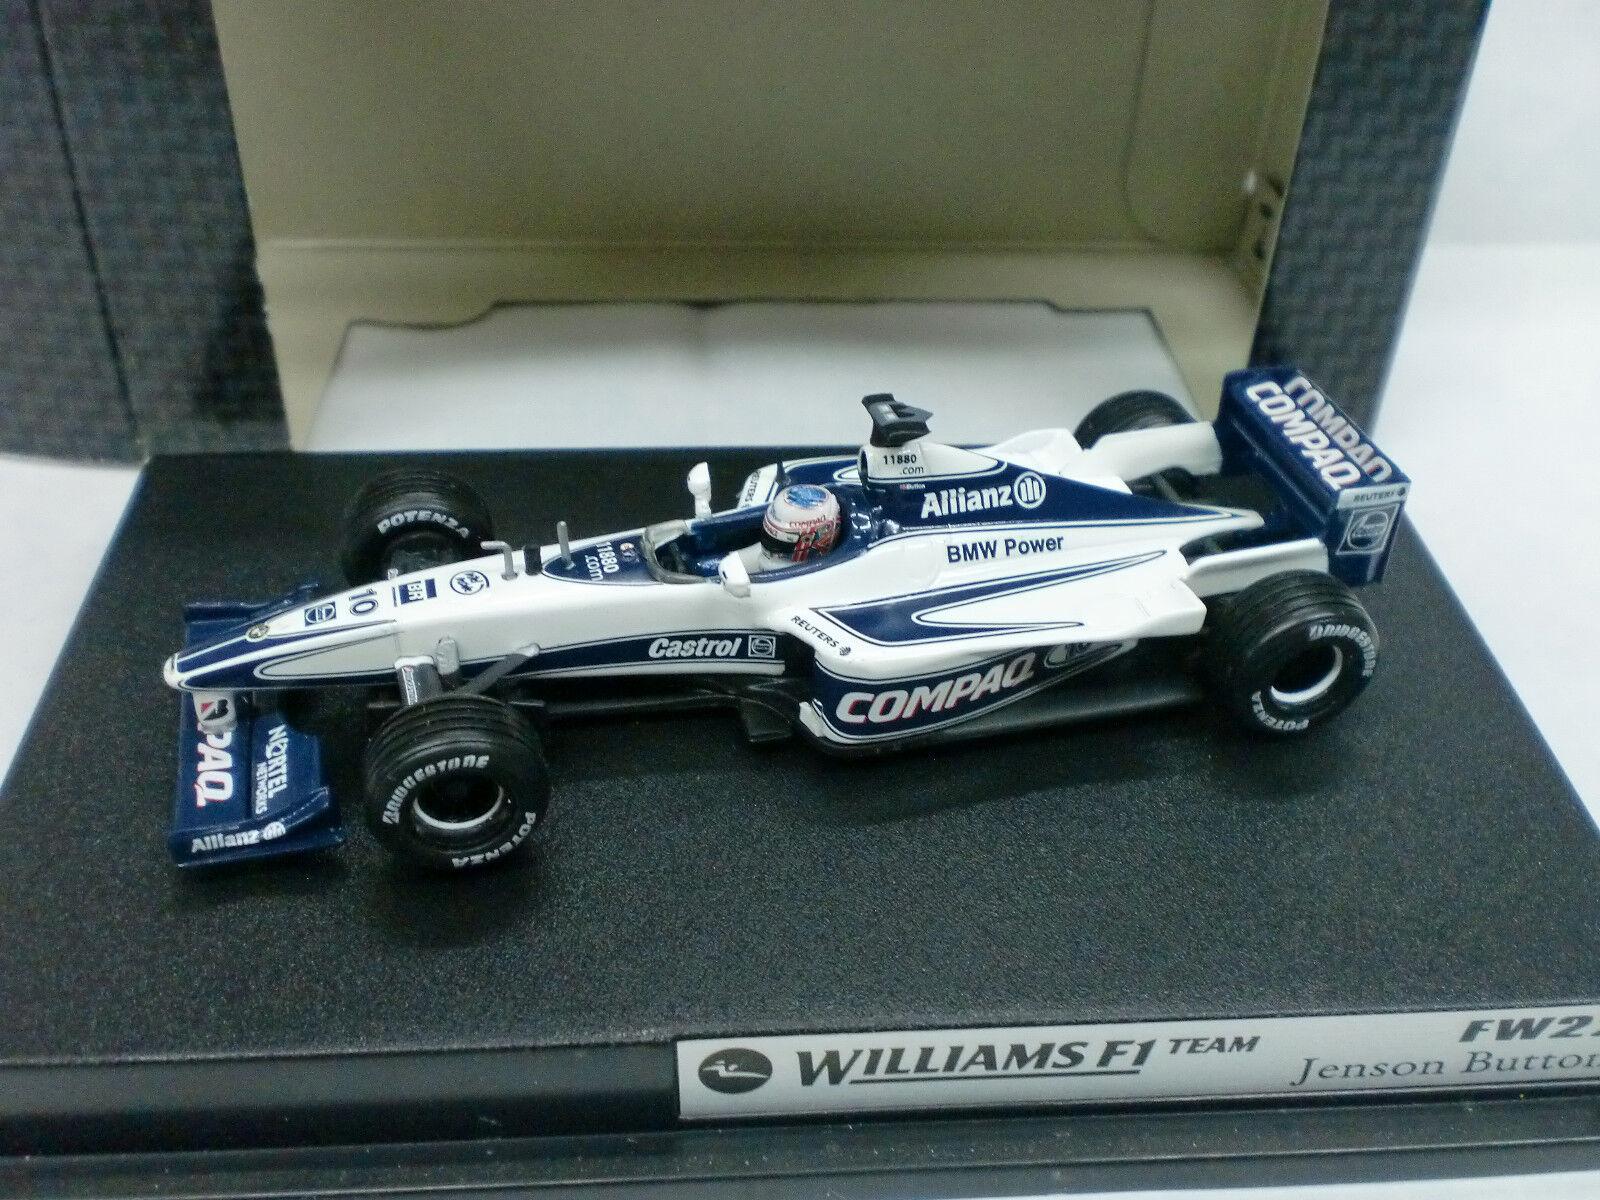 HOT WHEELS 1 43 - WILLIAMS FW 22 F1 2000 - J. BUTTON